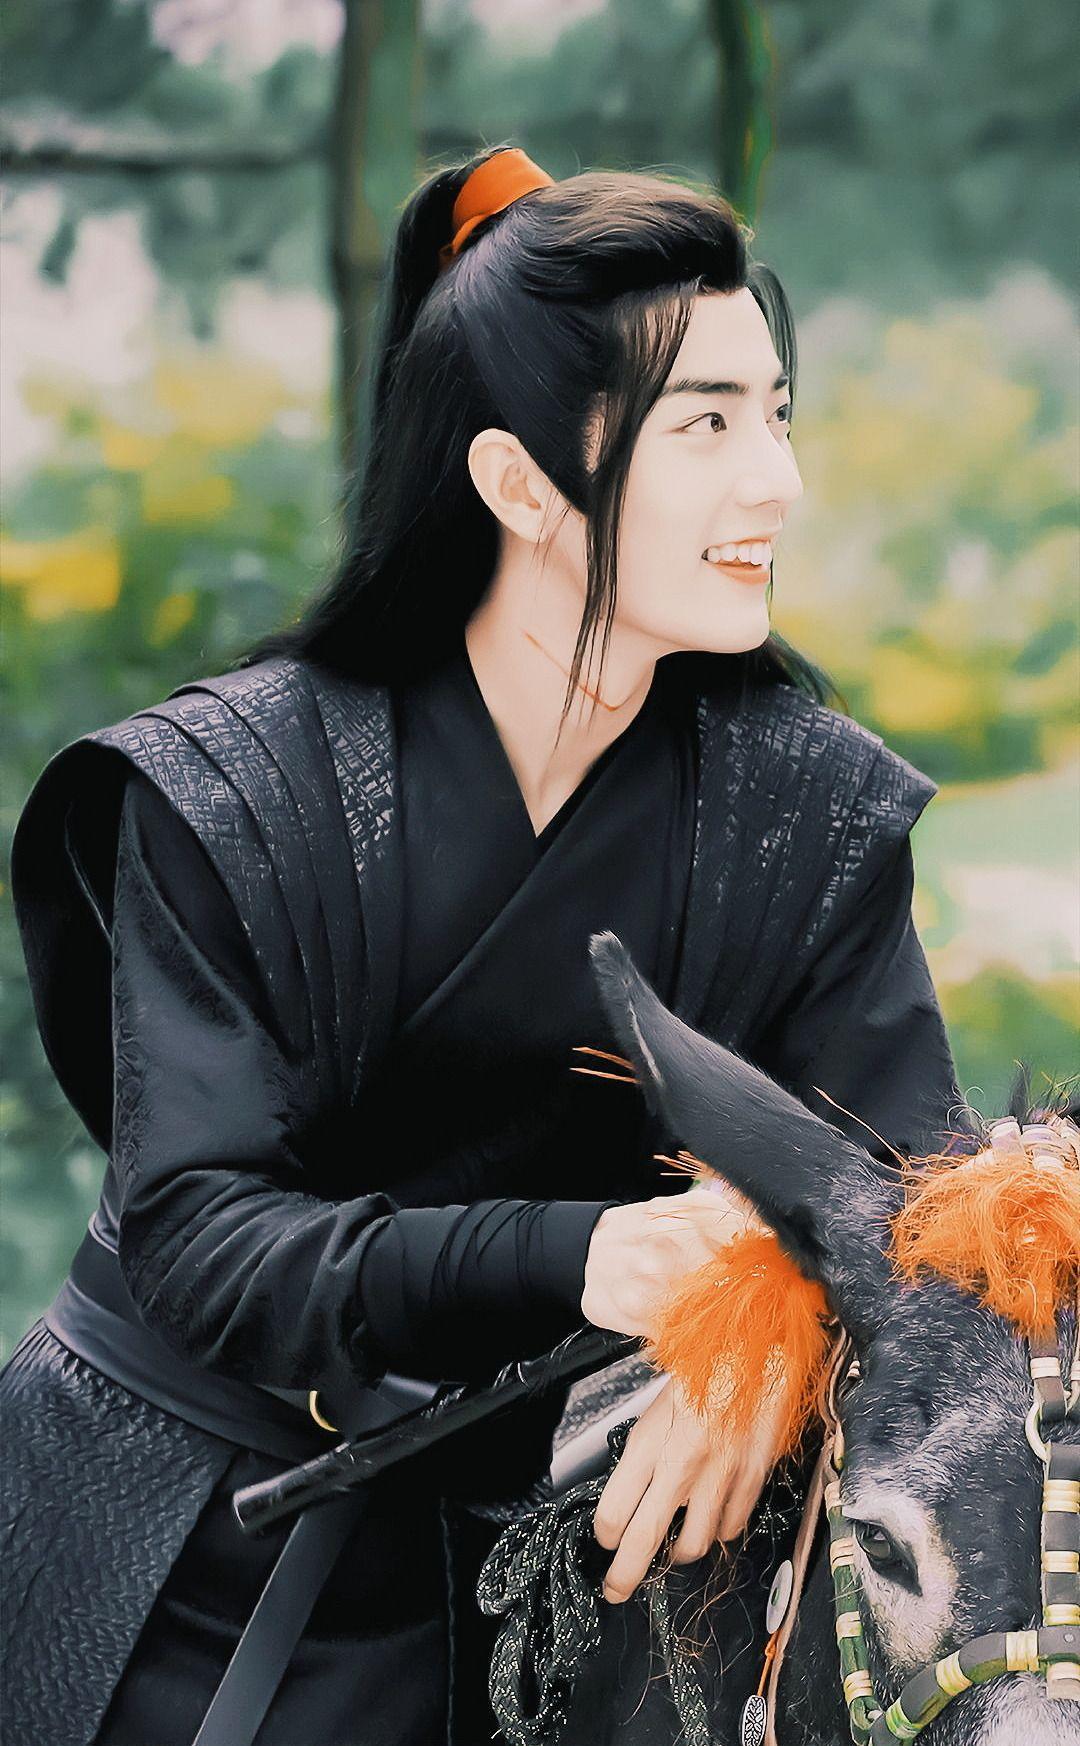 Ghim của shimofuka 🌸 trên Cute anime boy Diễn viên